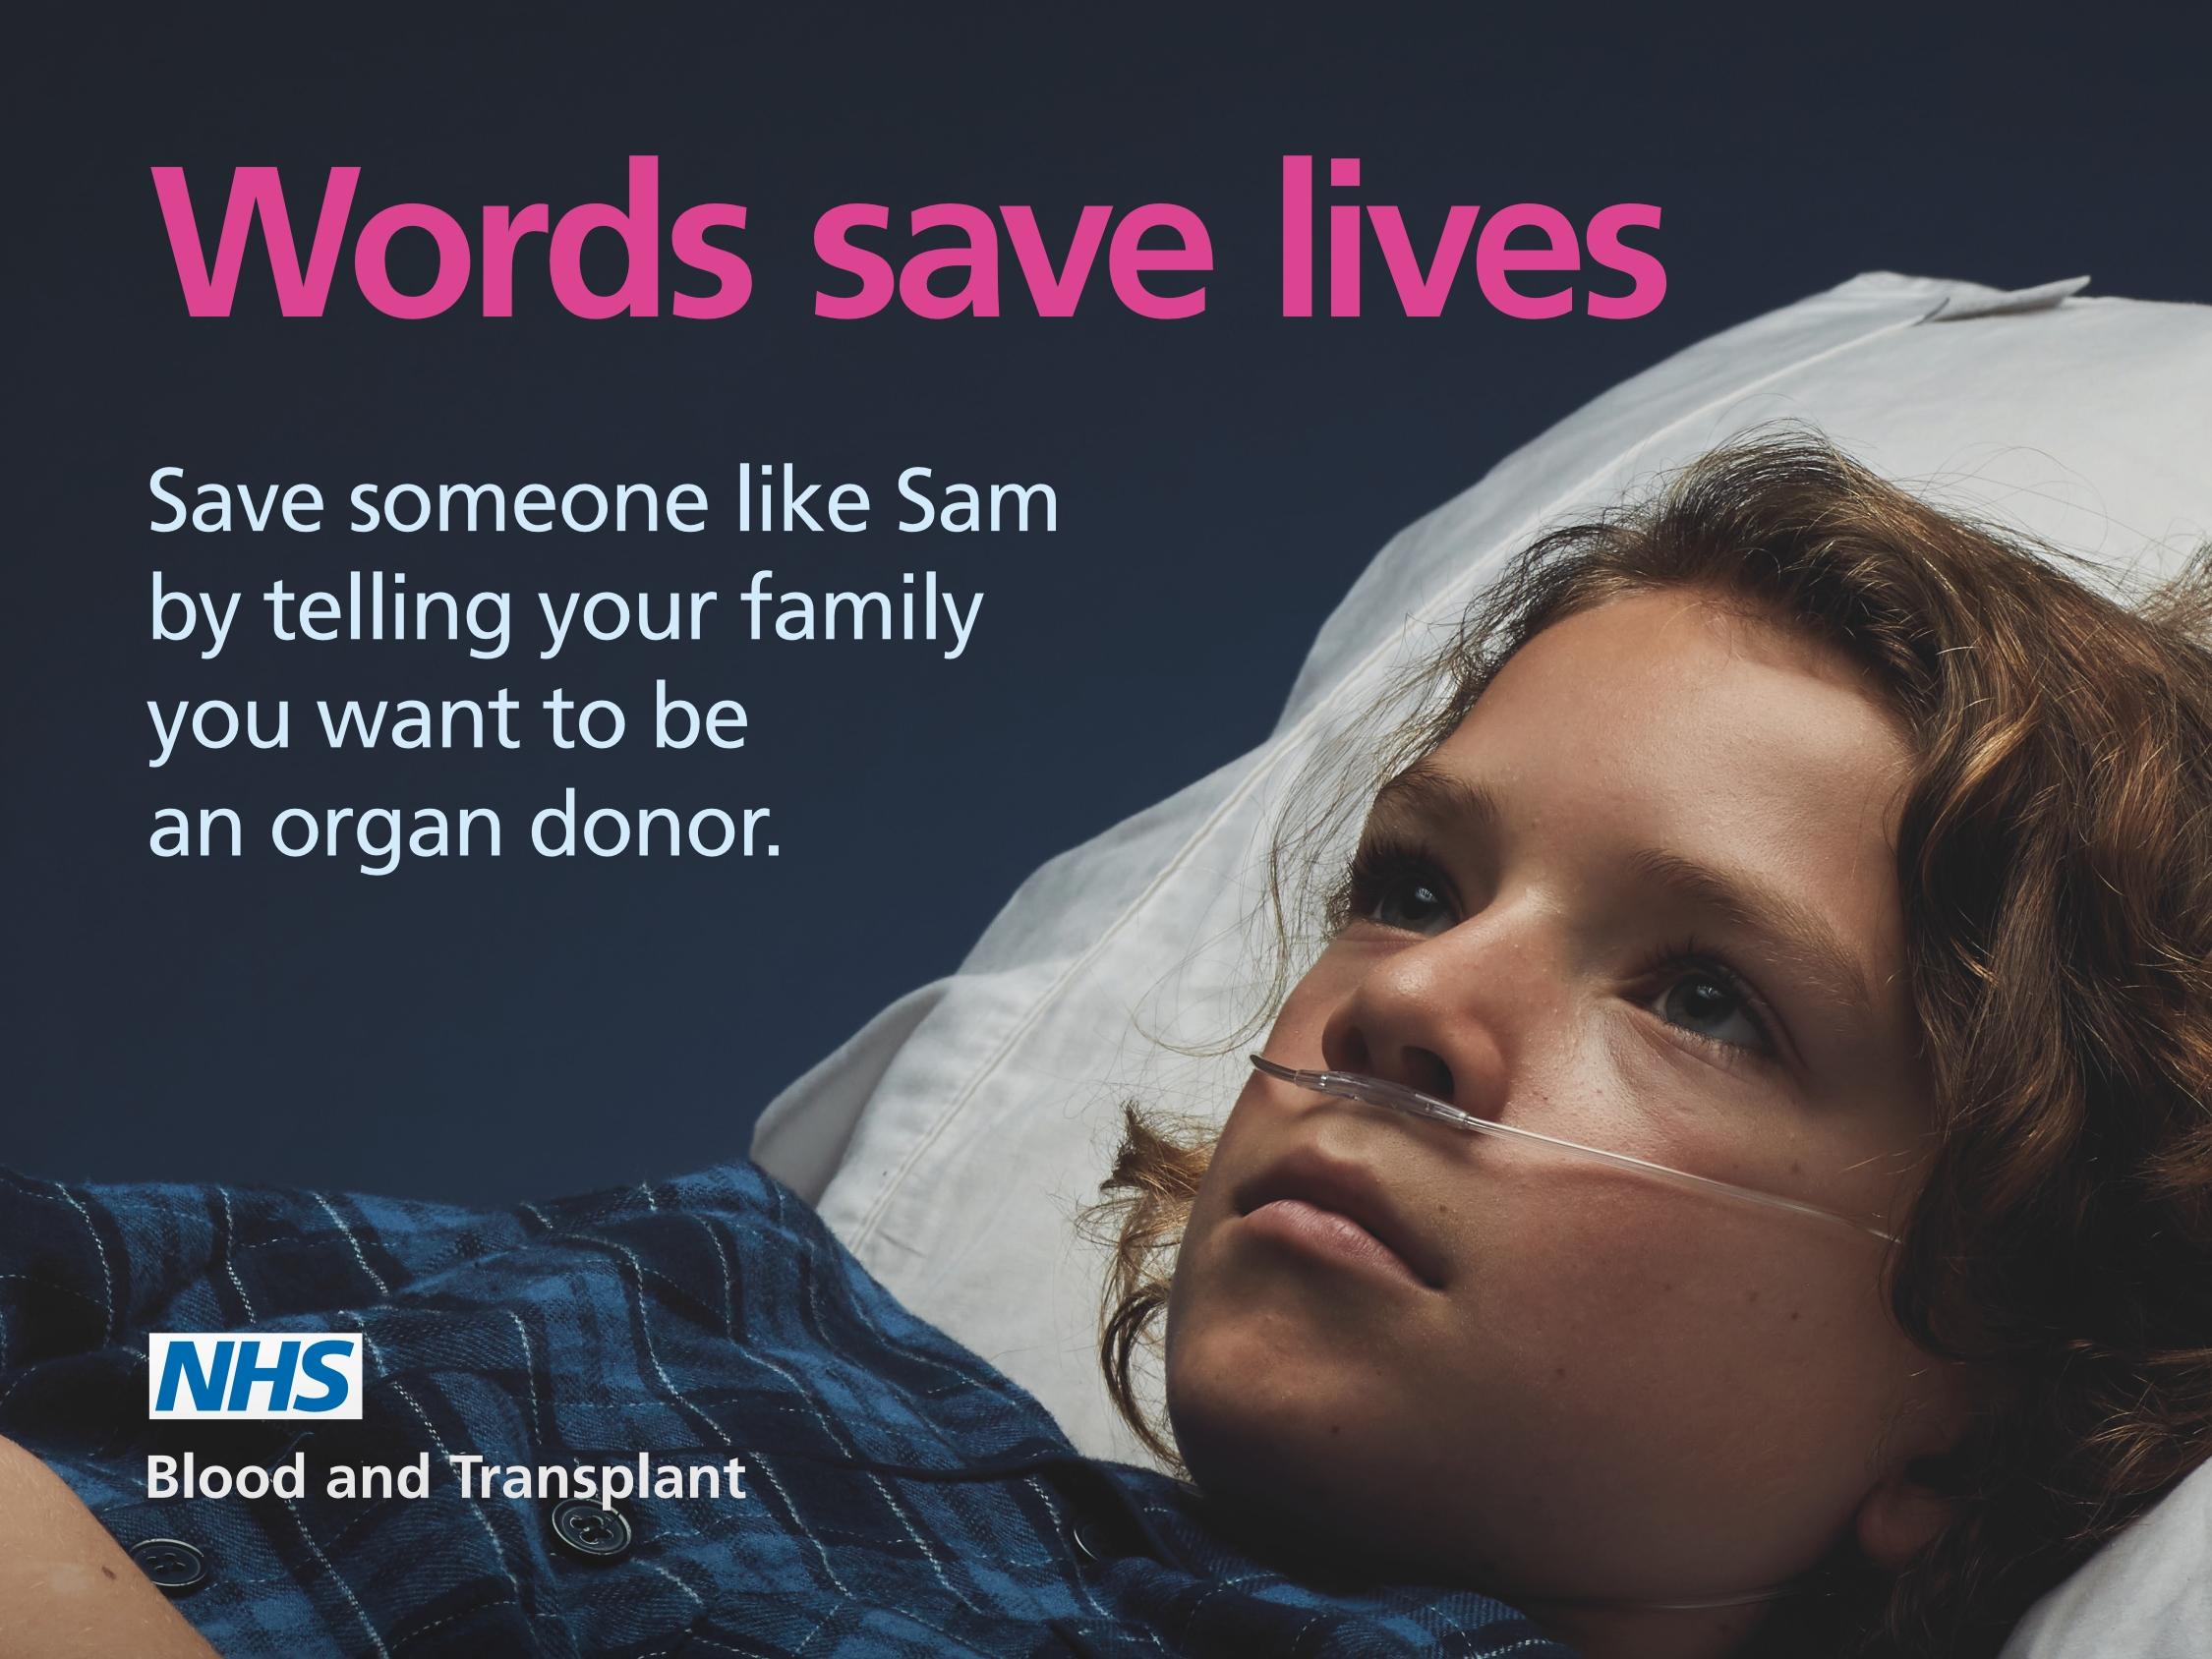 RESOURCES: Organ Donation Week, 3-9 September